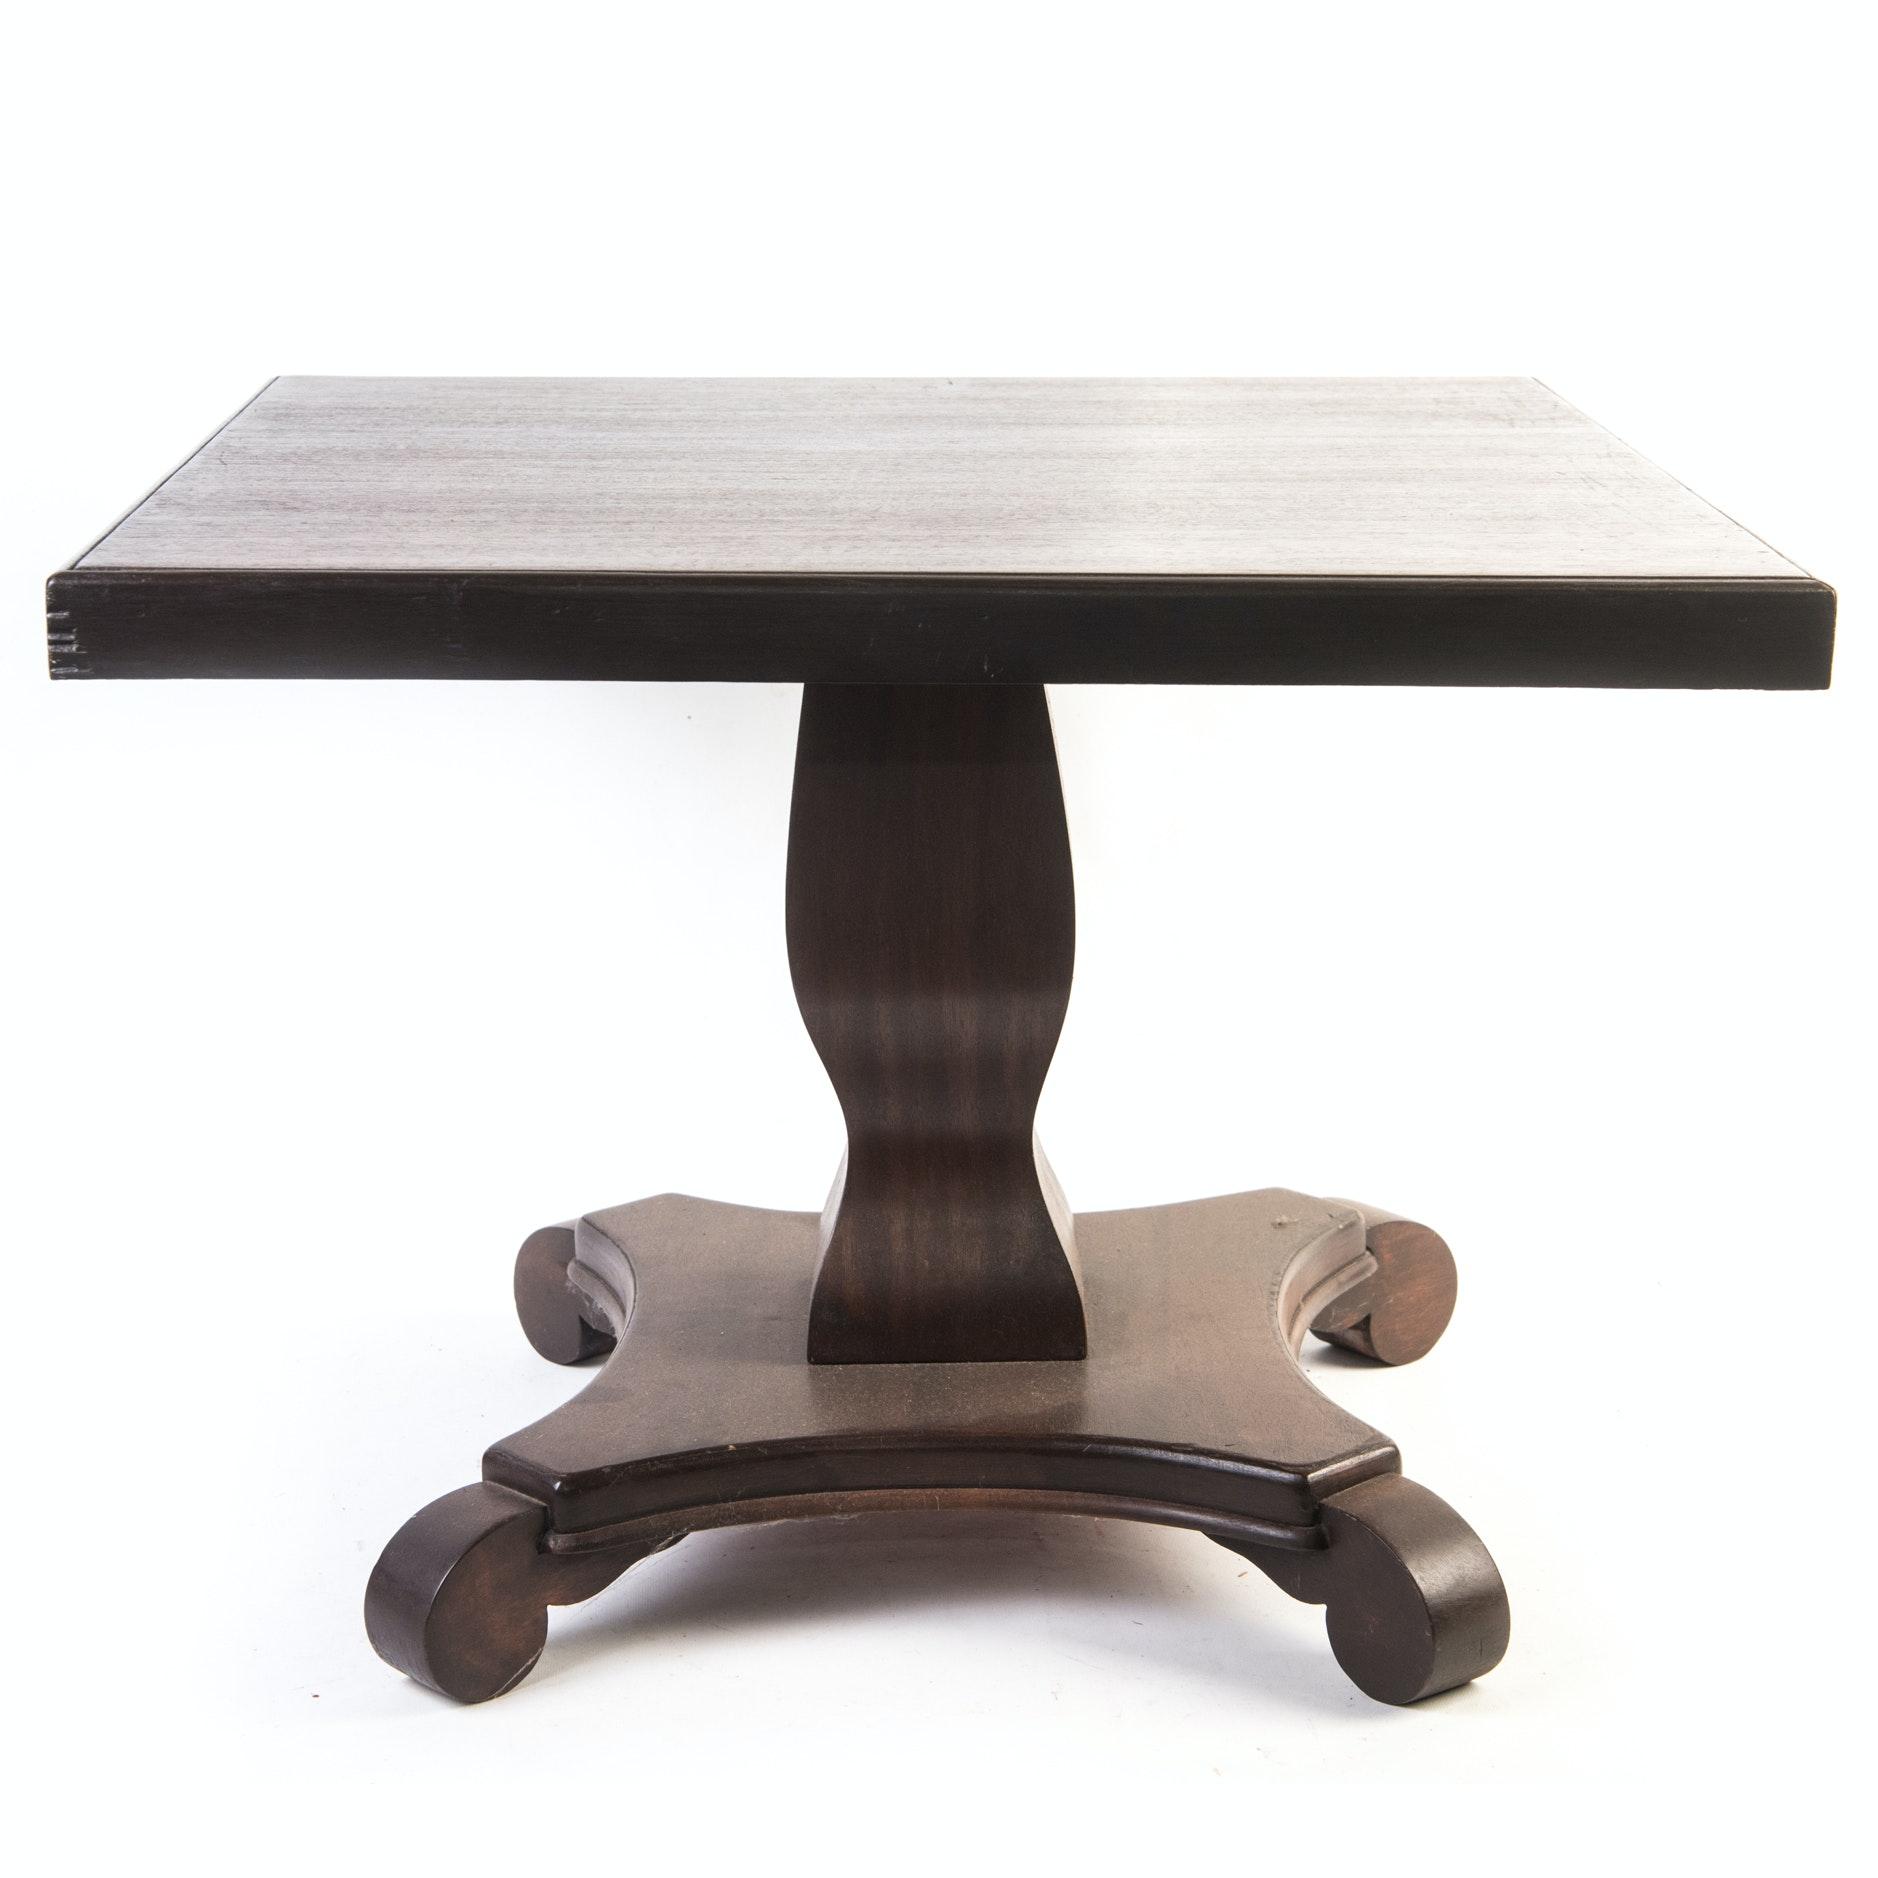 American Empire Revival Parlor Table